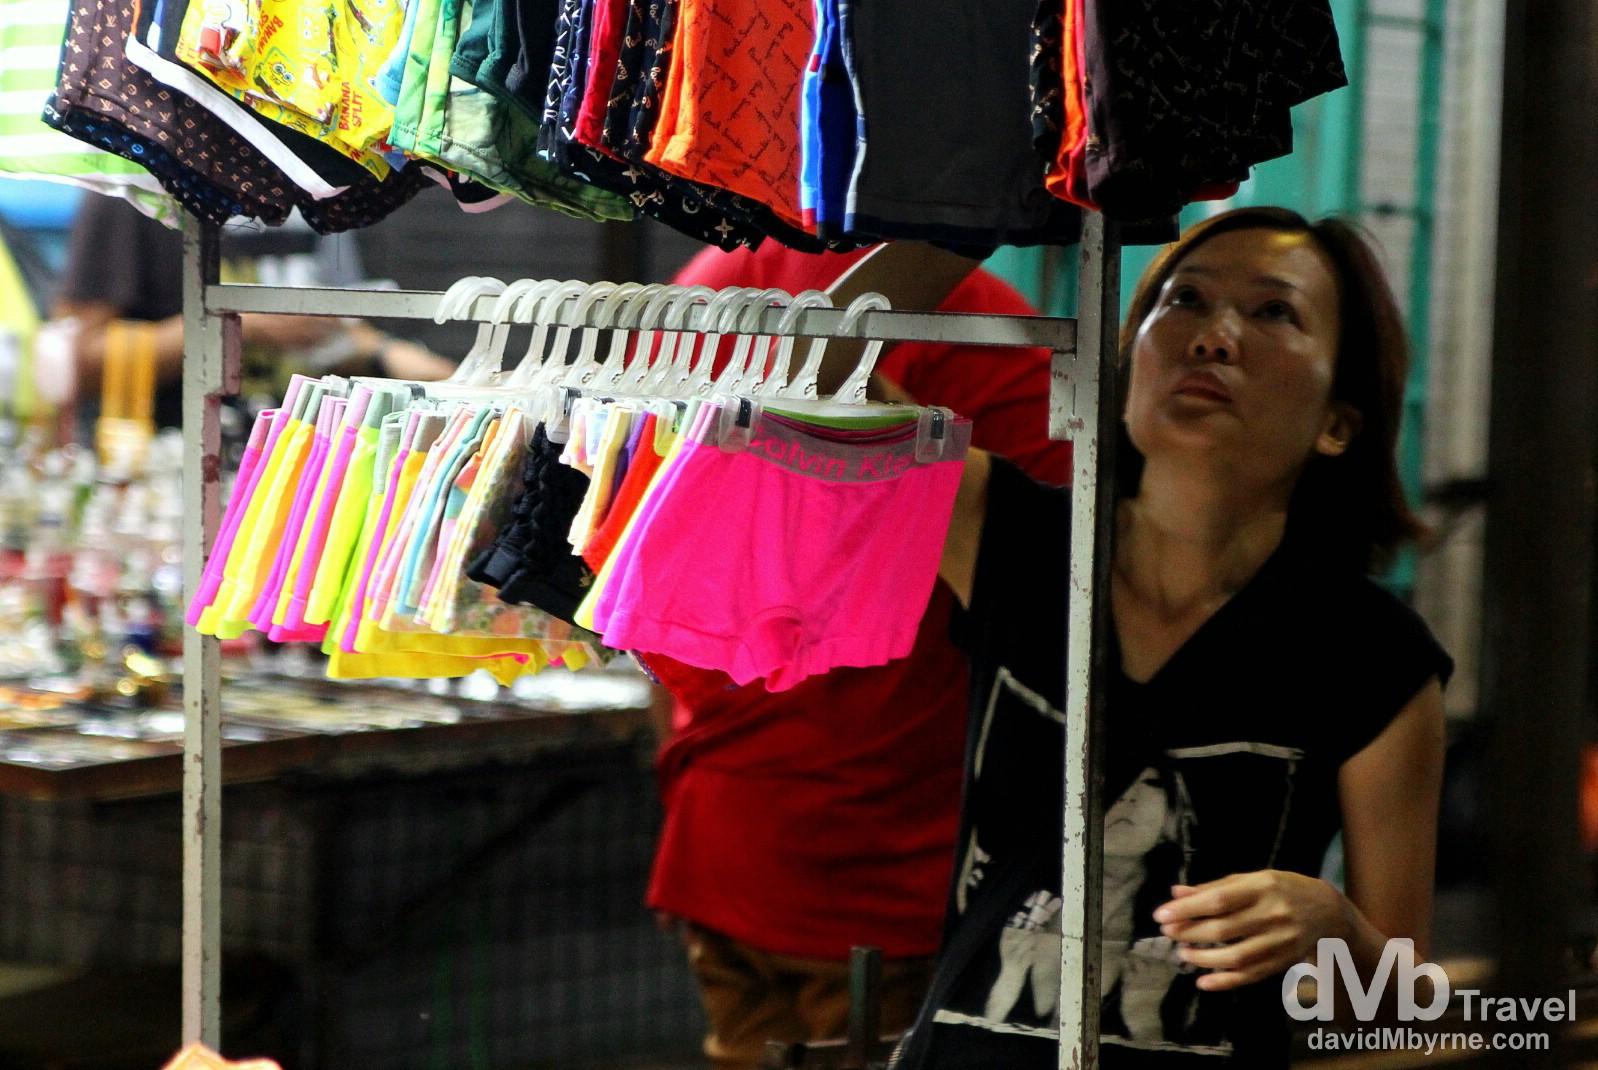 A trader in Petaling Street Market, Kuala Lumpur, Malaysia. March 30th 2012.